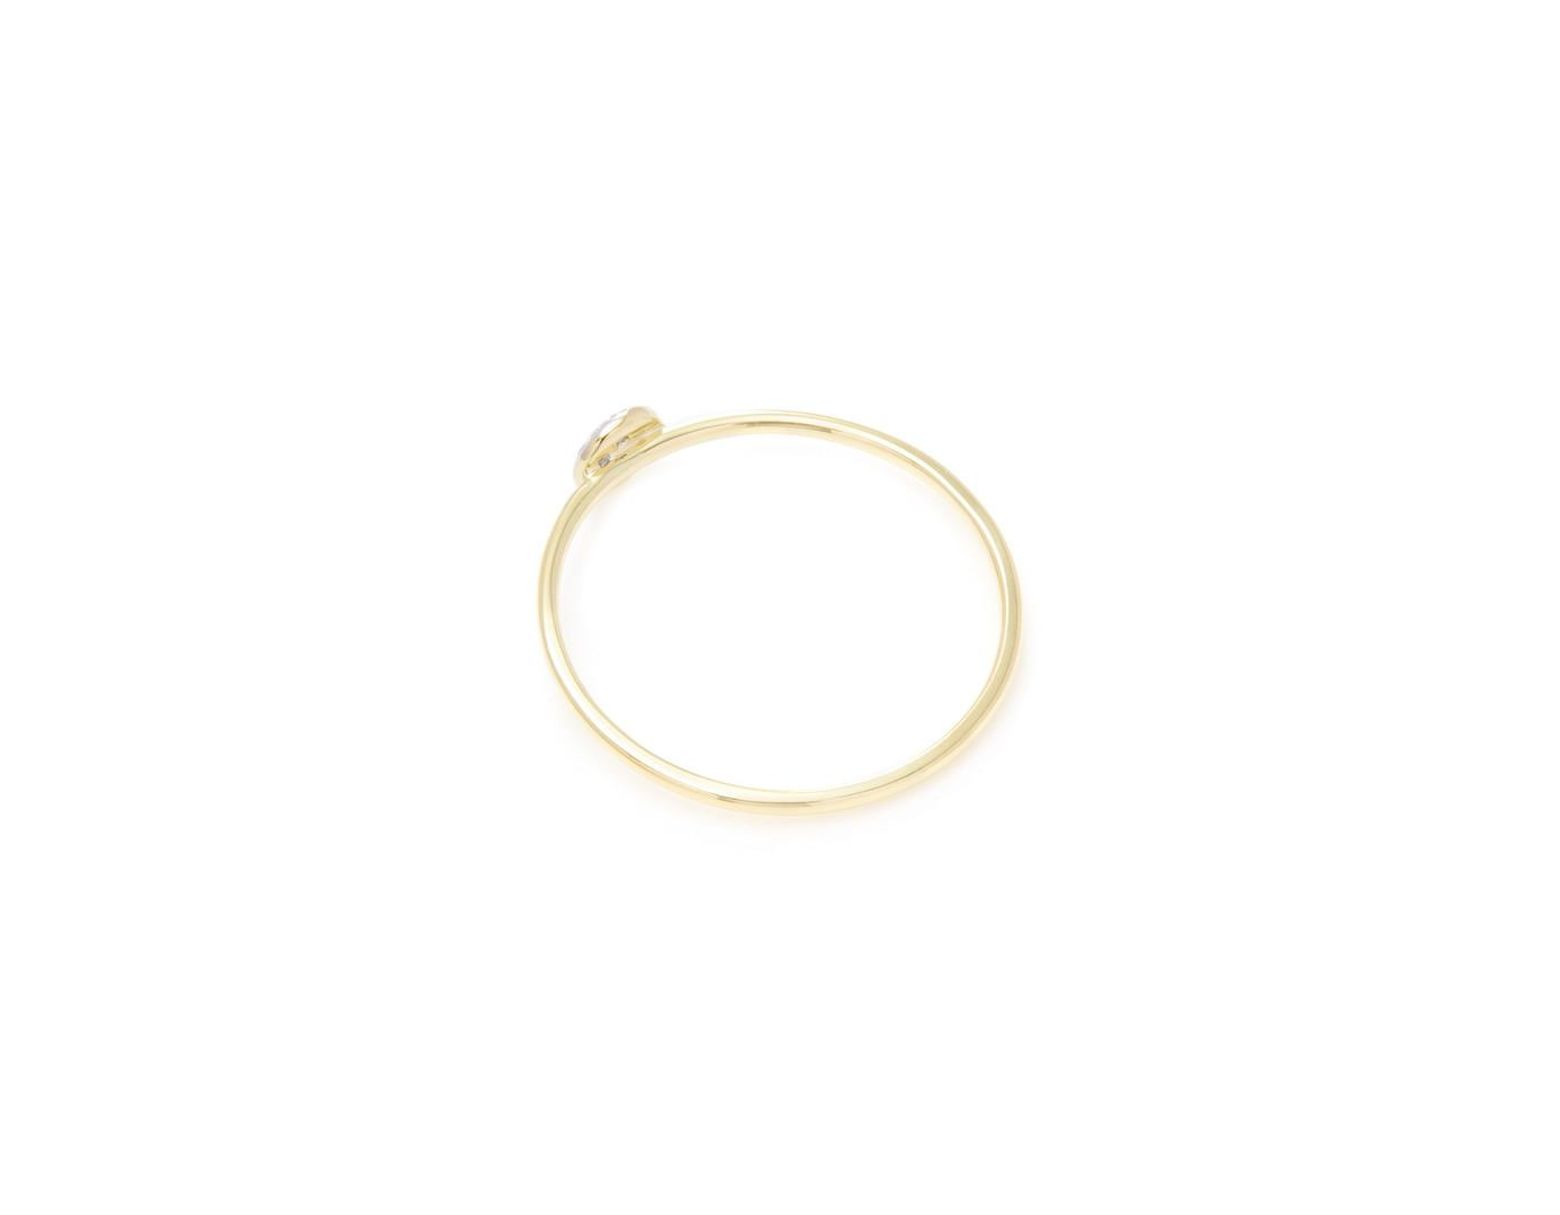 e56d3aa214c31 Danni 14k & 0.04 Ct. Tw. Diamond Micro Dot Stackable Ring in ...